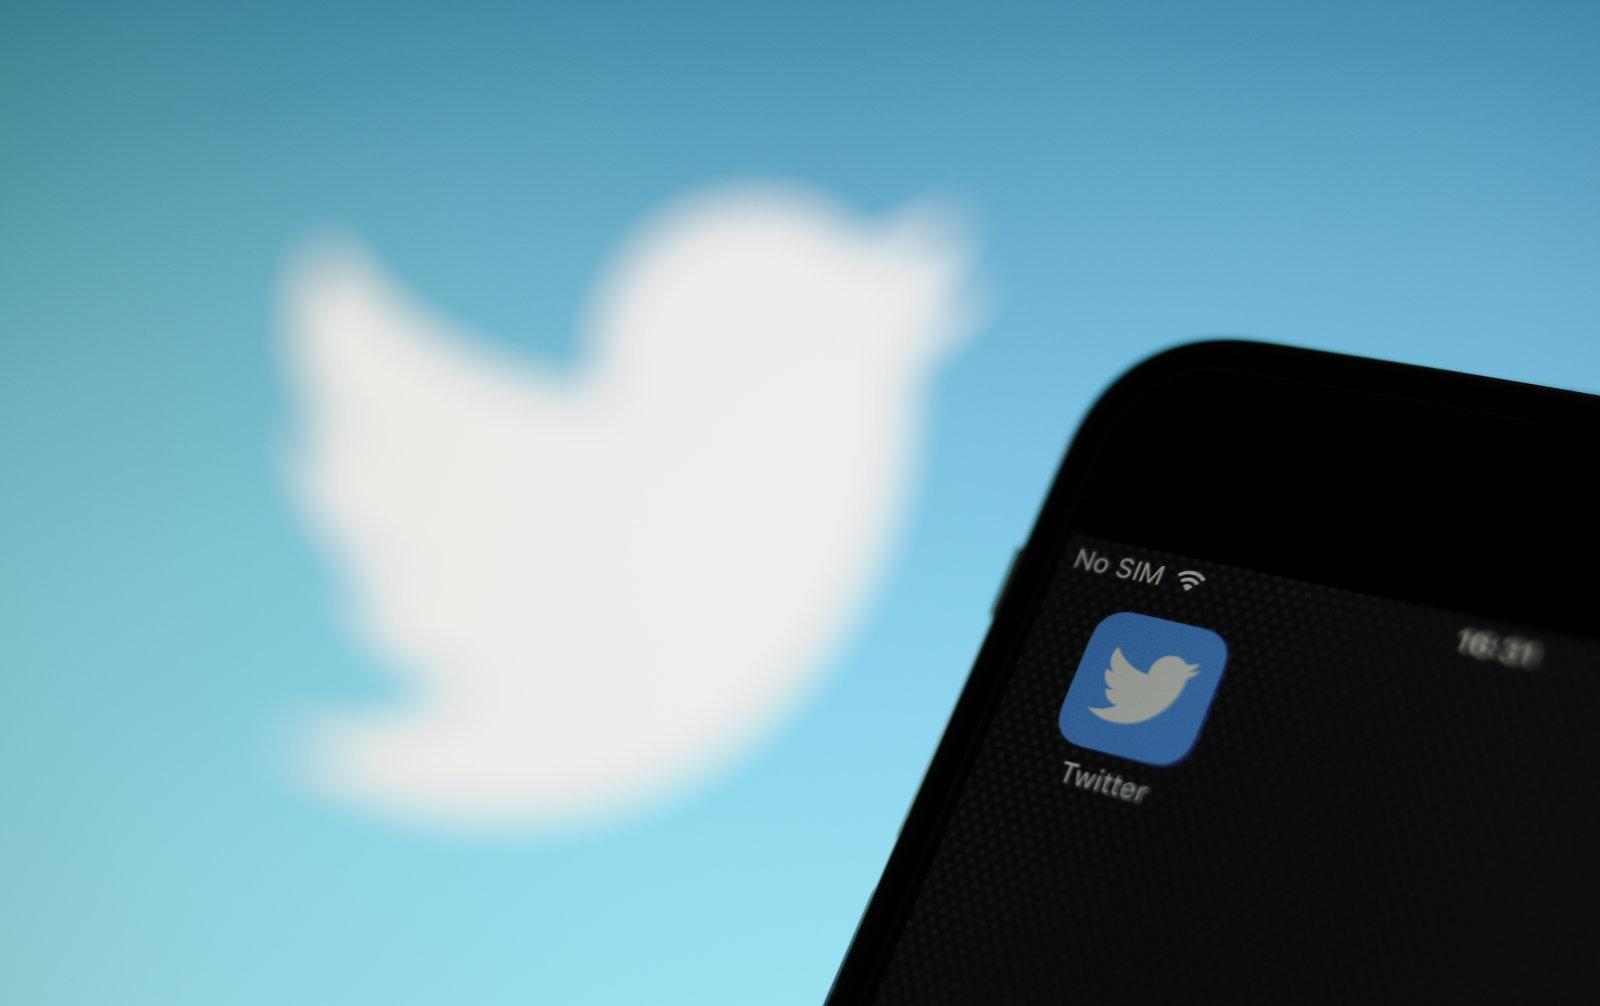 Security firm hijacks high-profile UK Twitter accounts